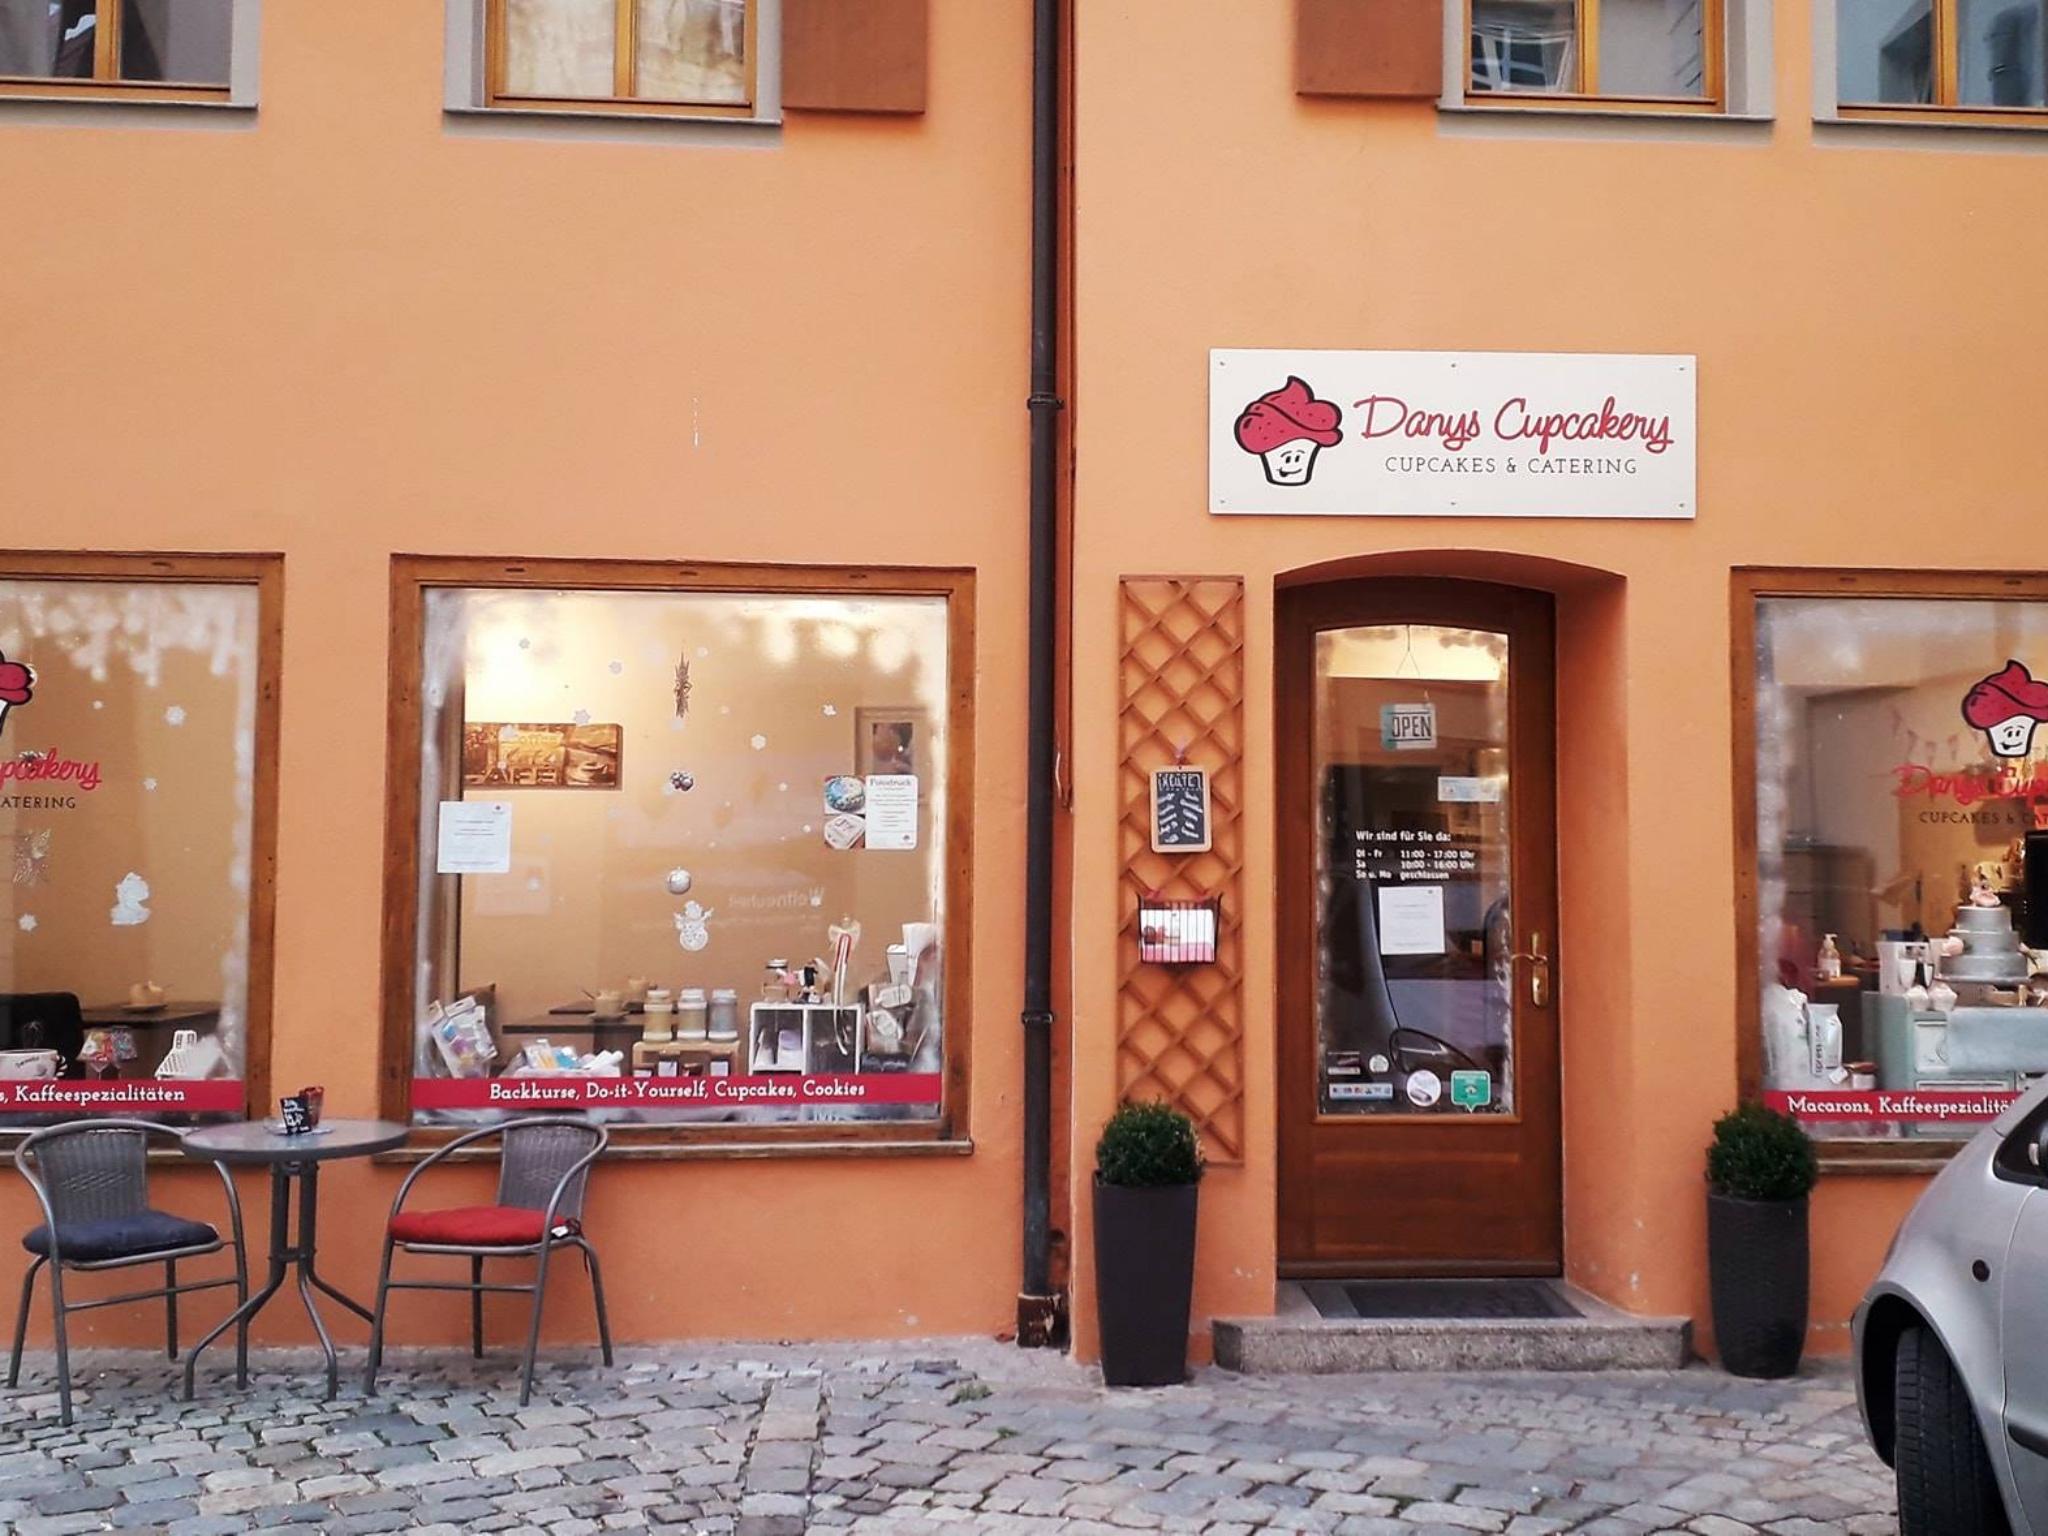 Danys Cupcakery in Ansbach. Foto: Danys Cupcakers